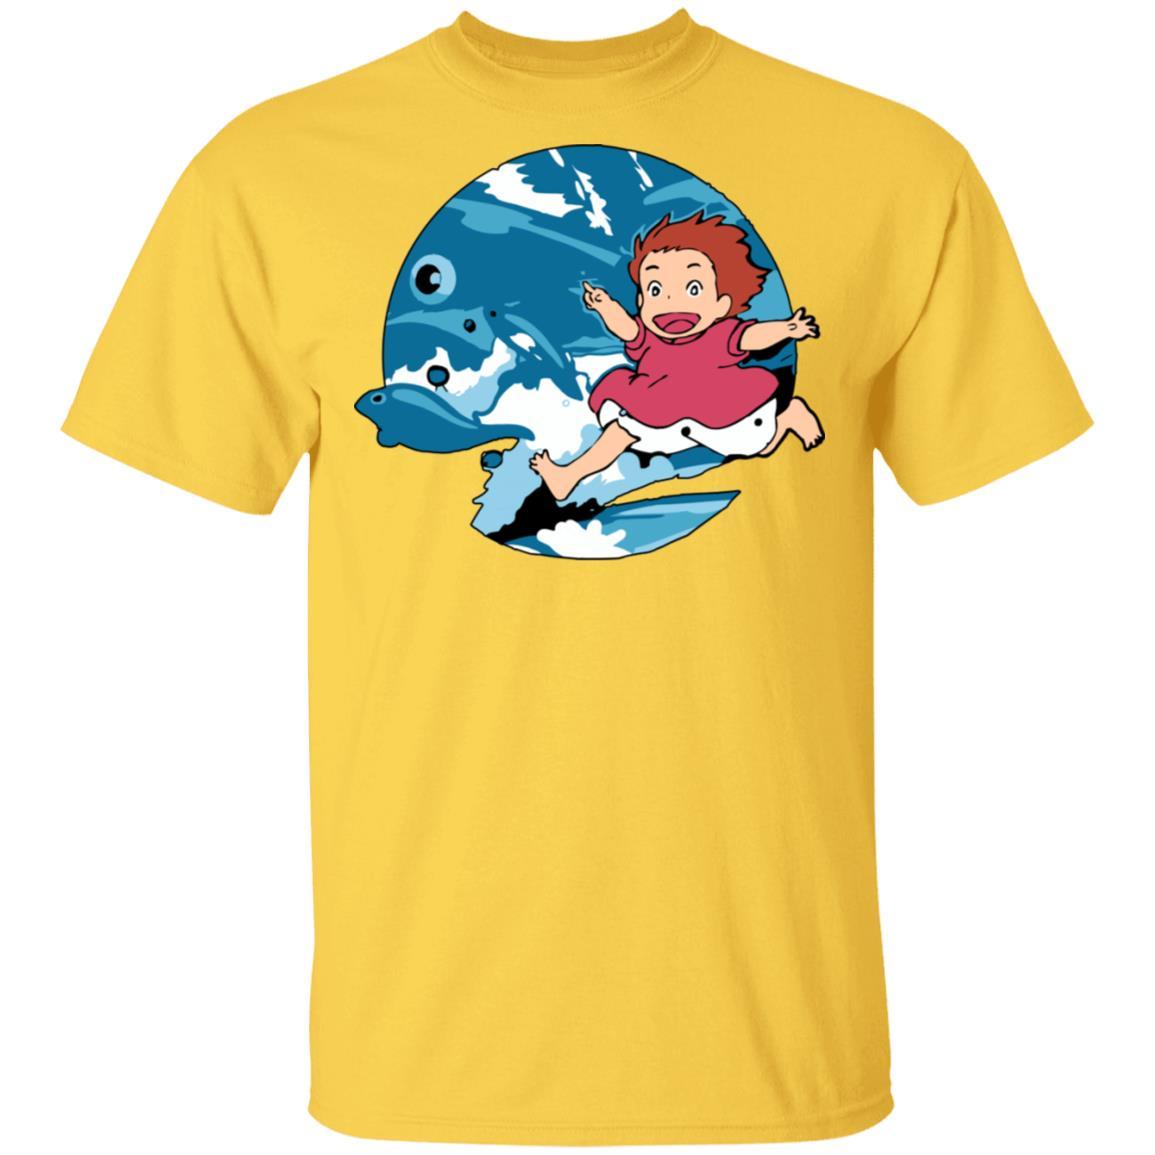 Ghibli Studio Ponyo On The Waves T shirt Unisex